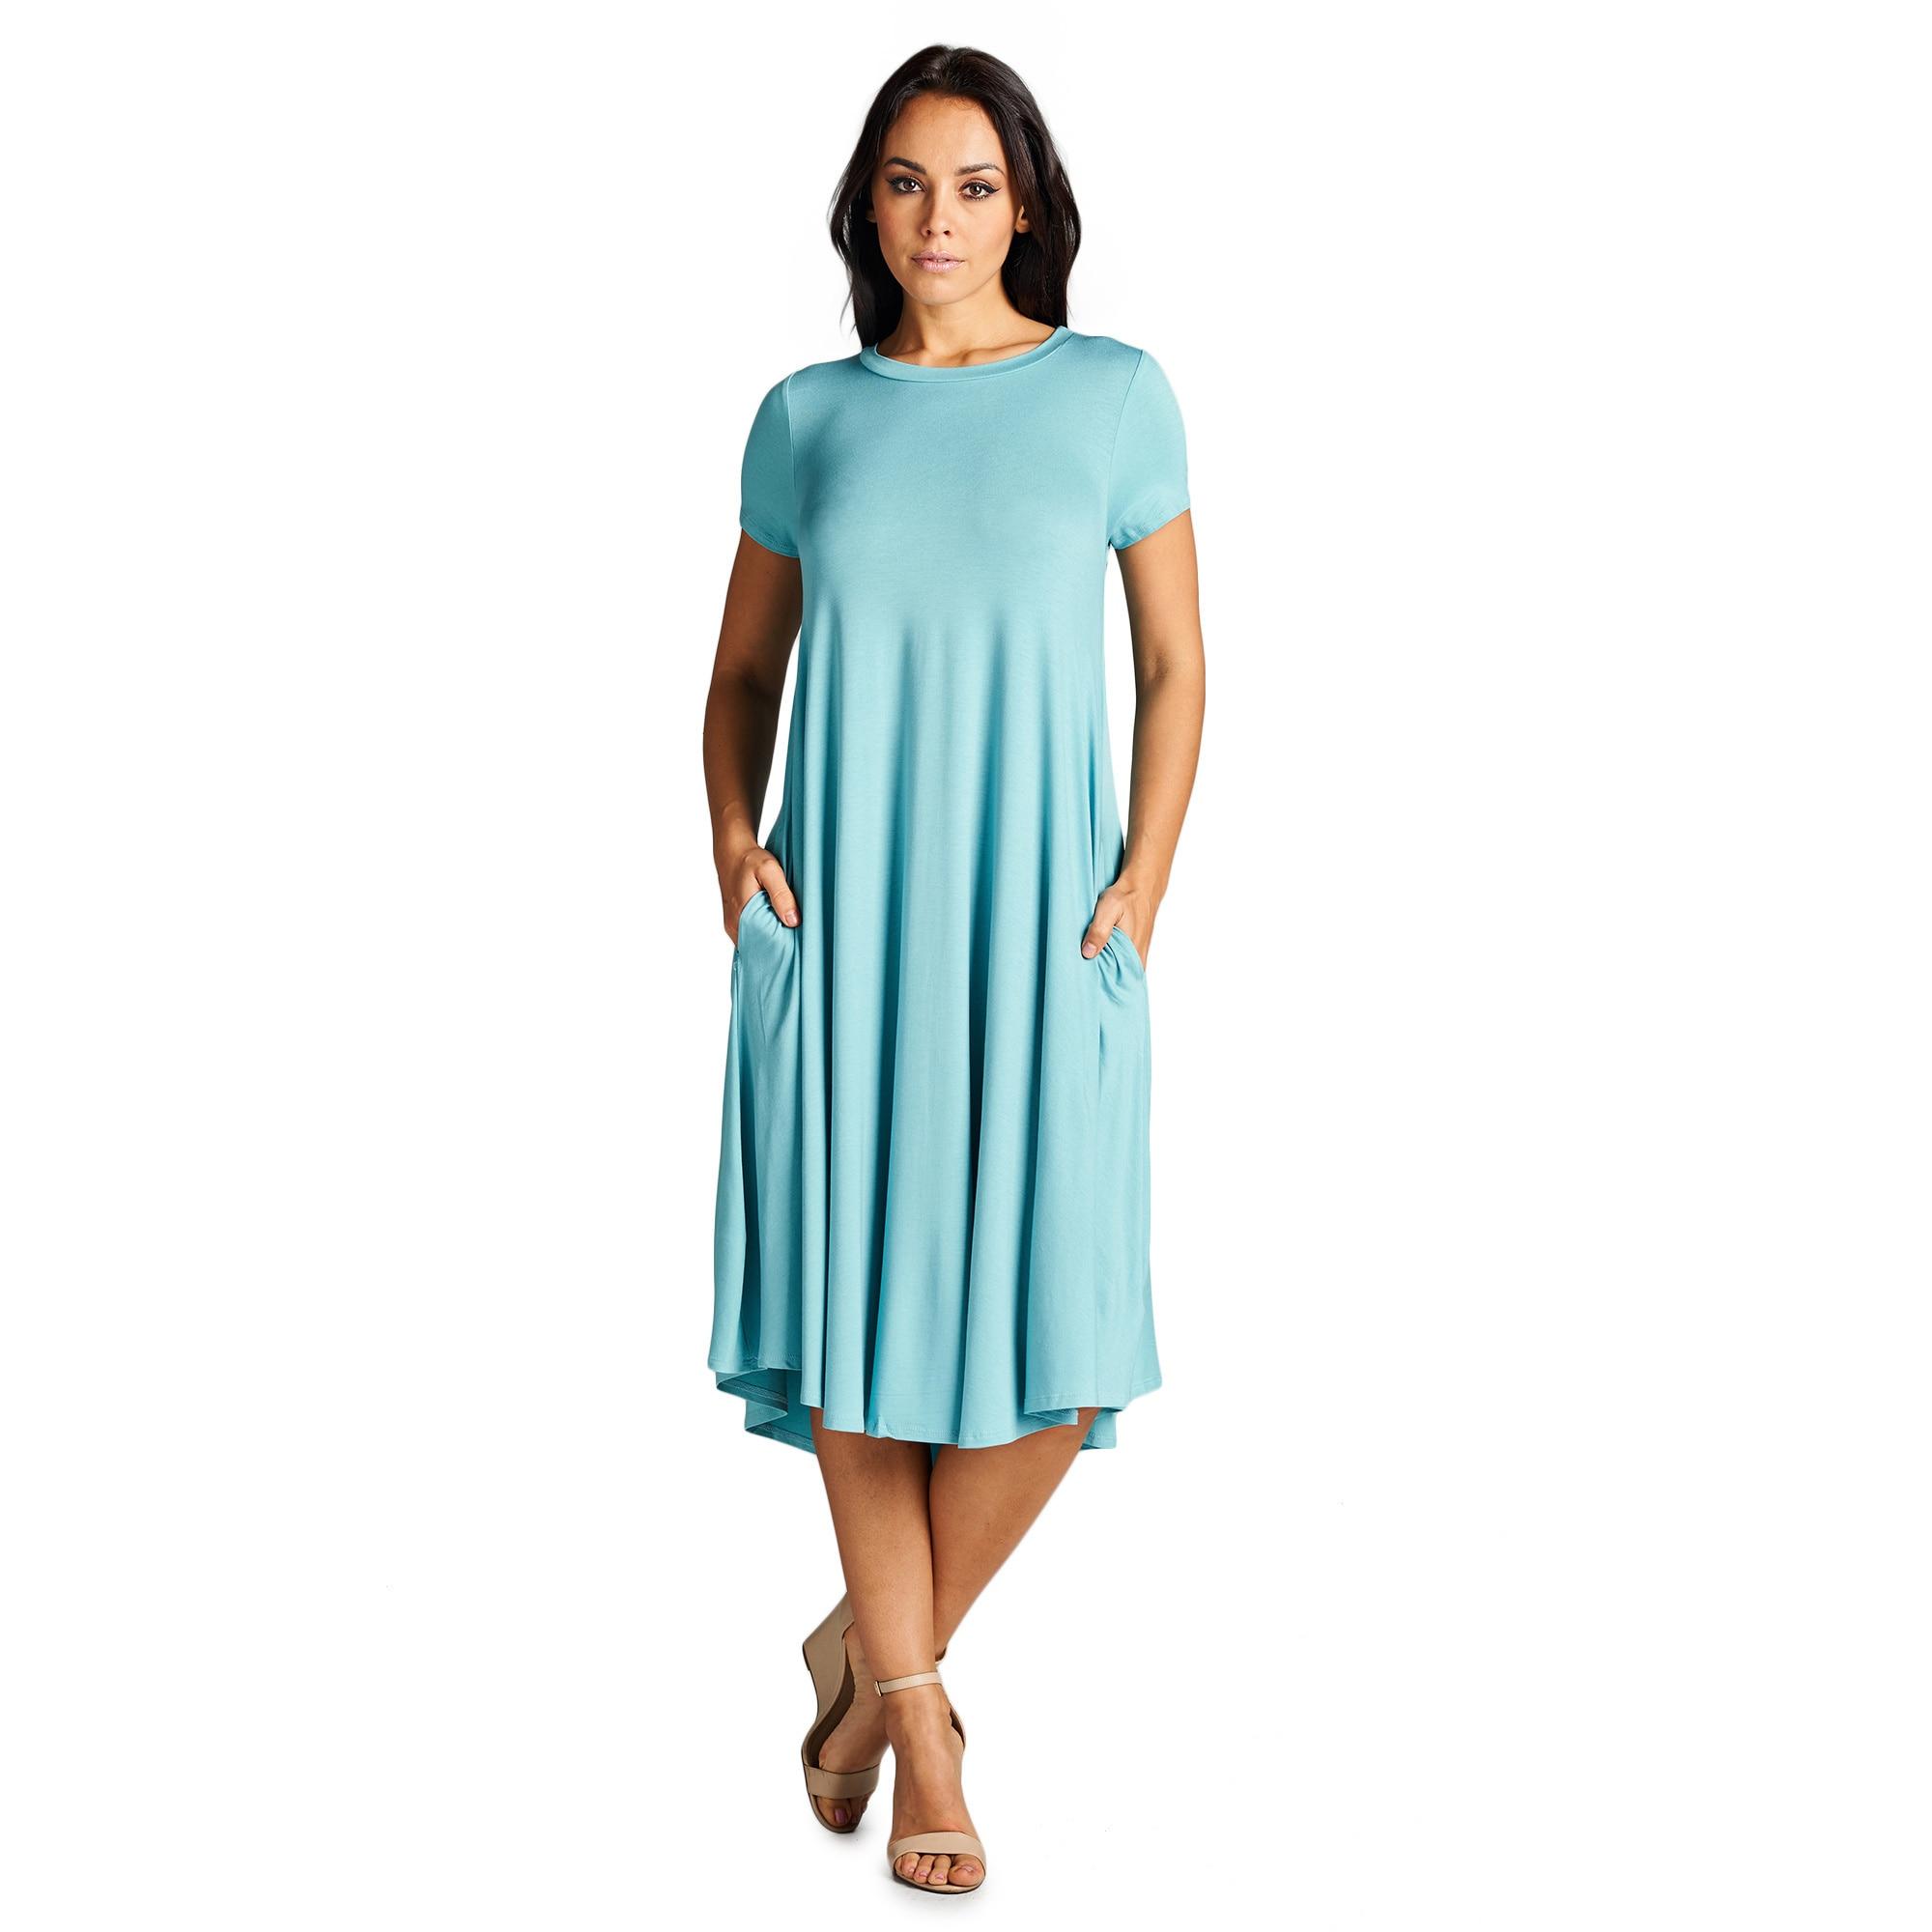 Shop Spicy Mix Aurelia Teal Rayon Jersey Short-sleeve Midi Tunic ...